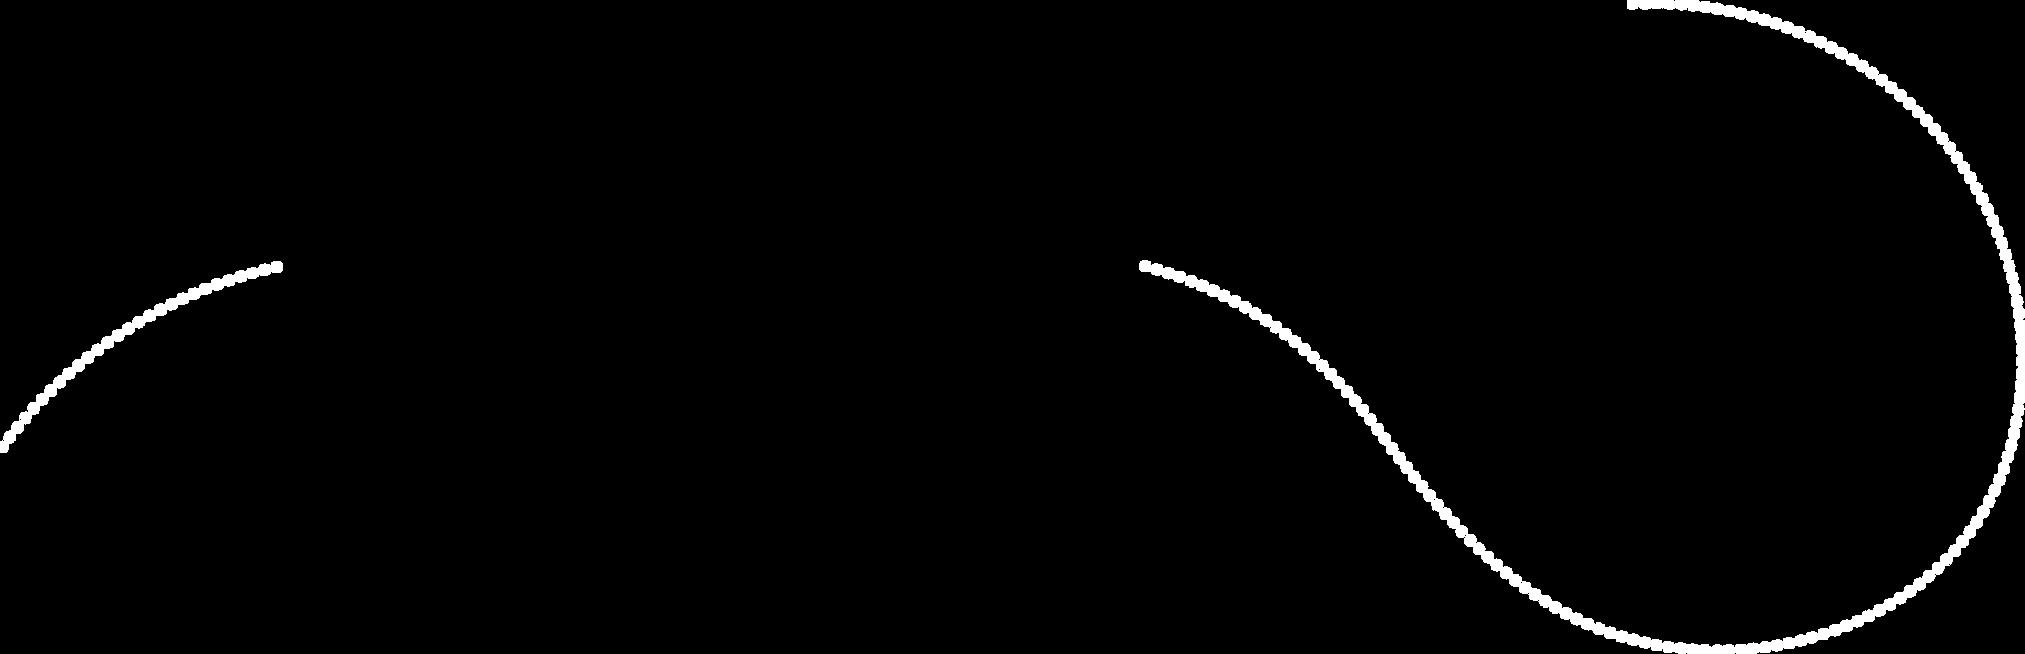 bee lines-06.png